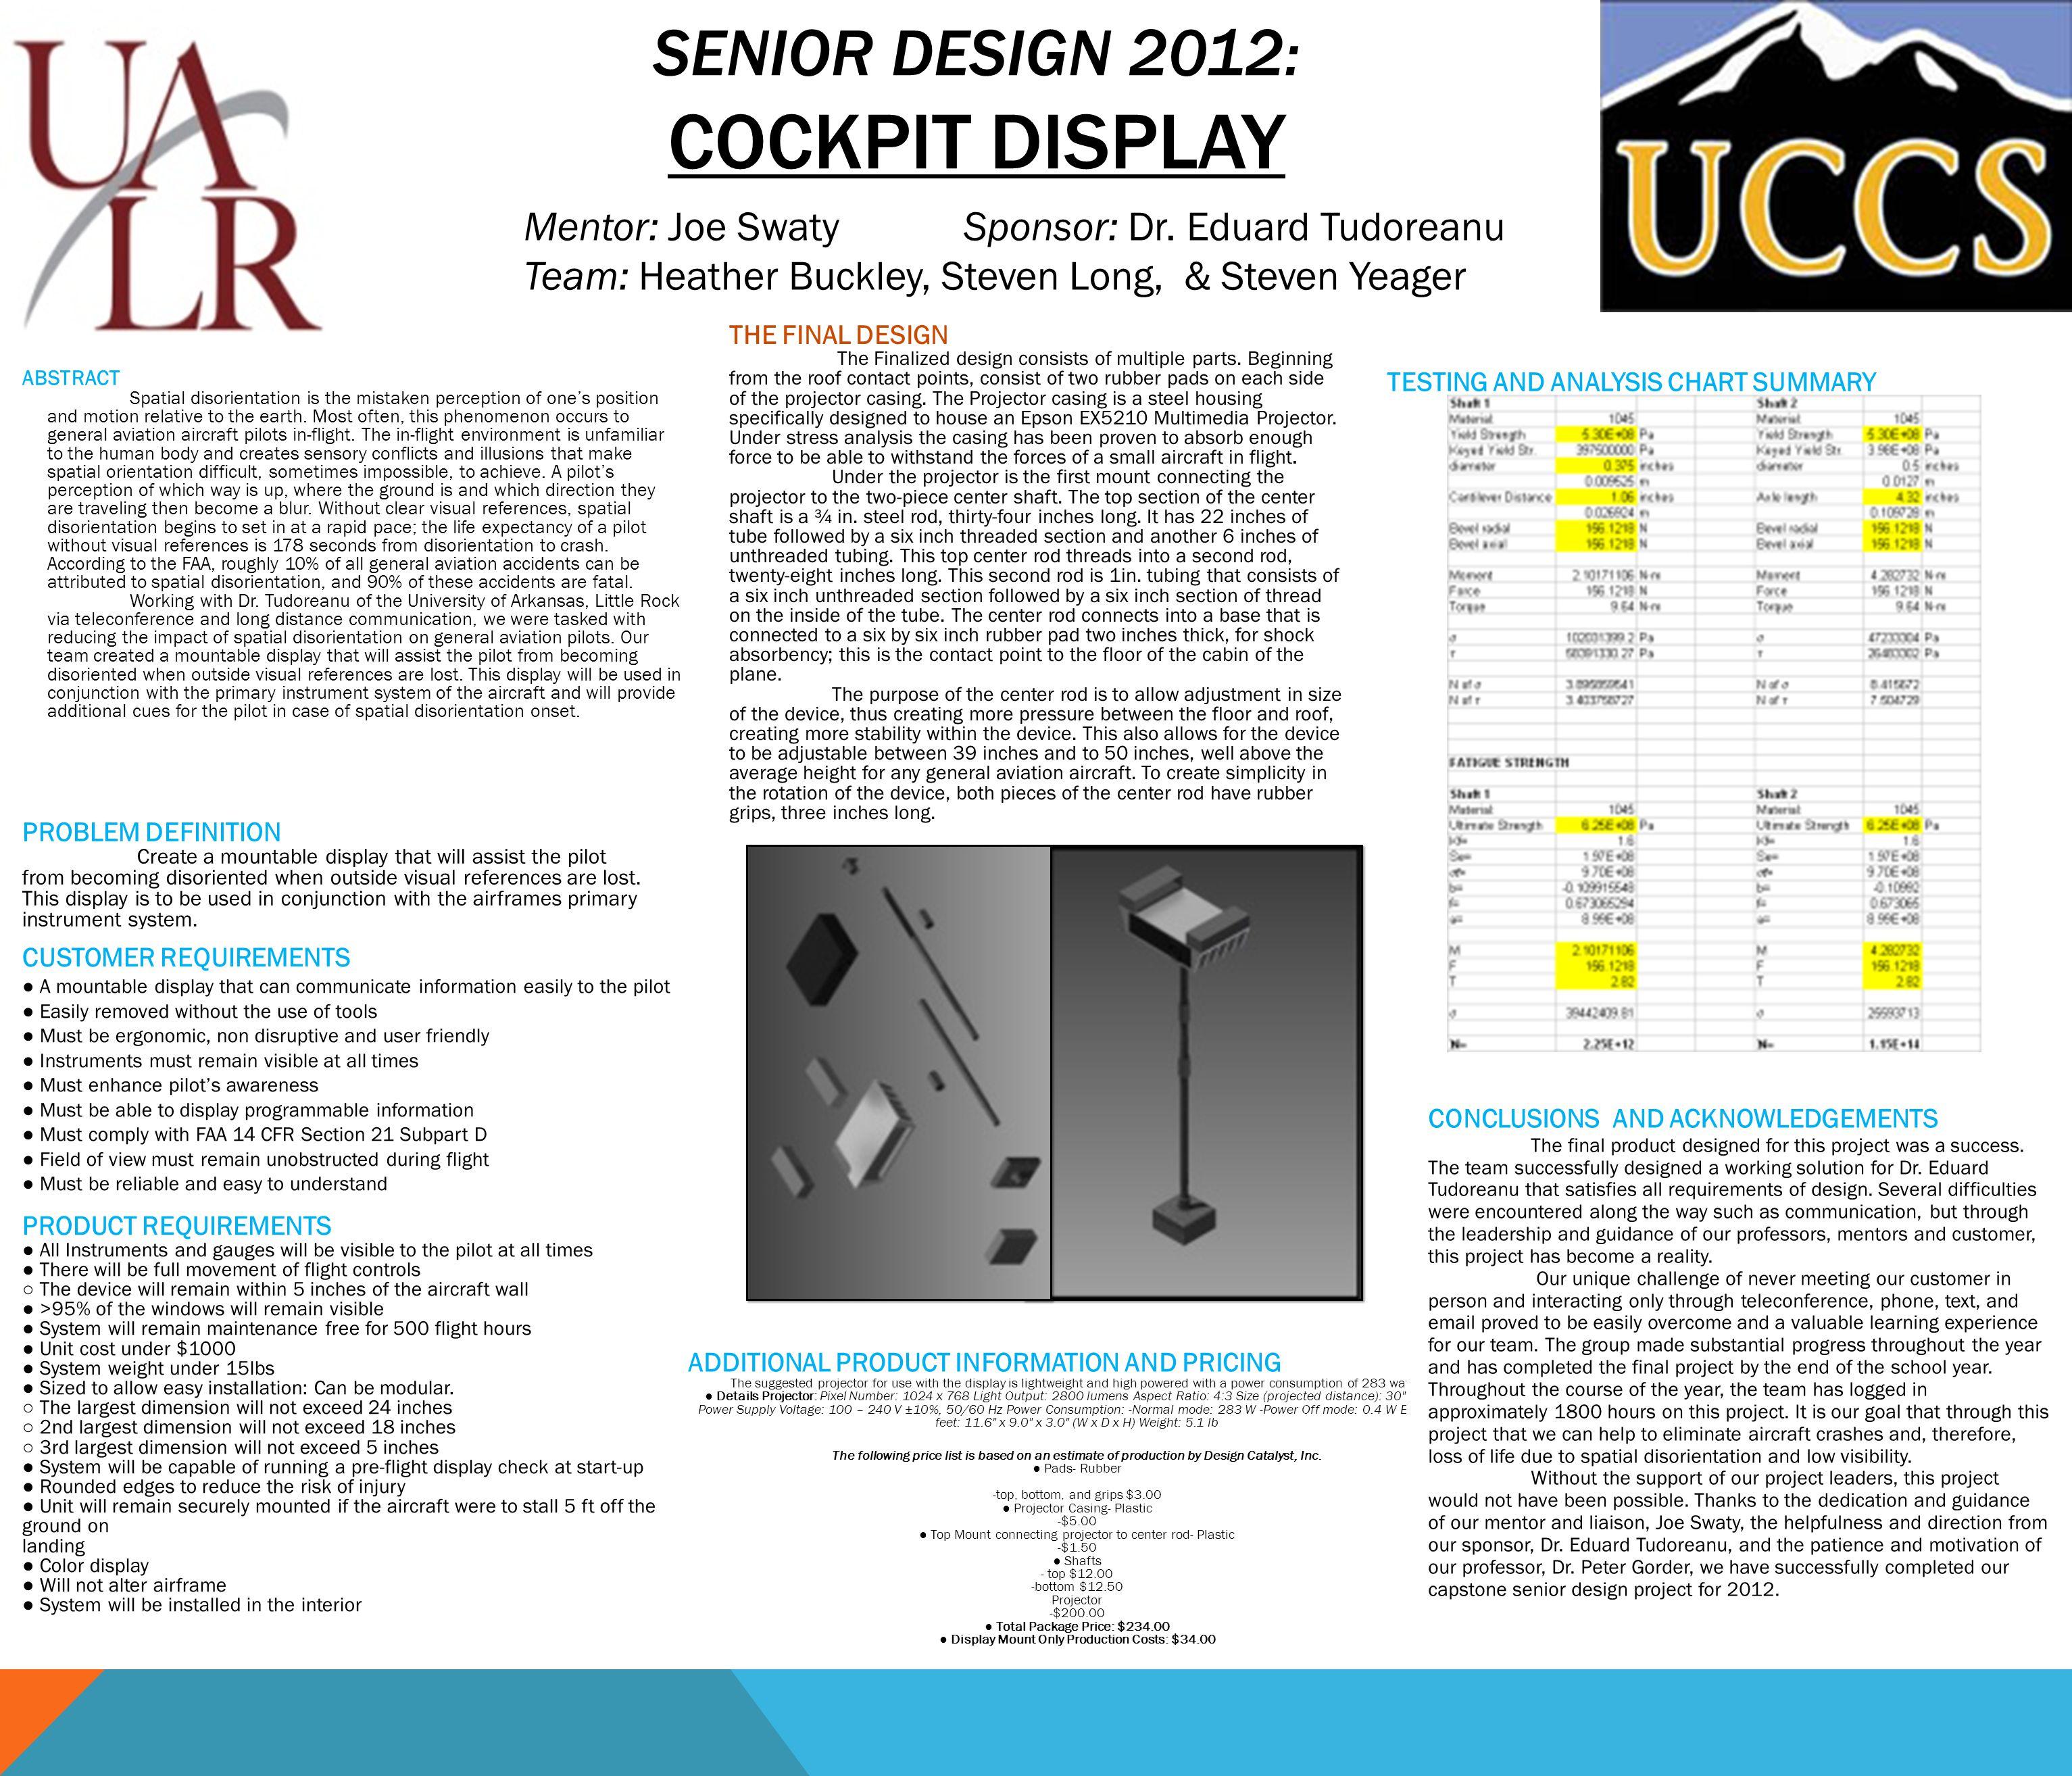 SENIOR DESIGN 2012: COCKPIT DISPLAY Mentor: Joe SwatySponsor: Dr.